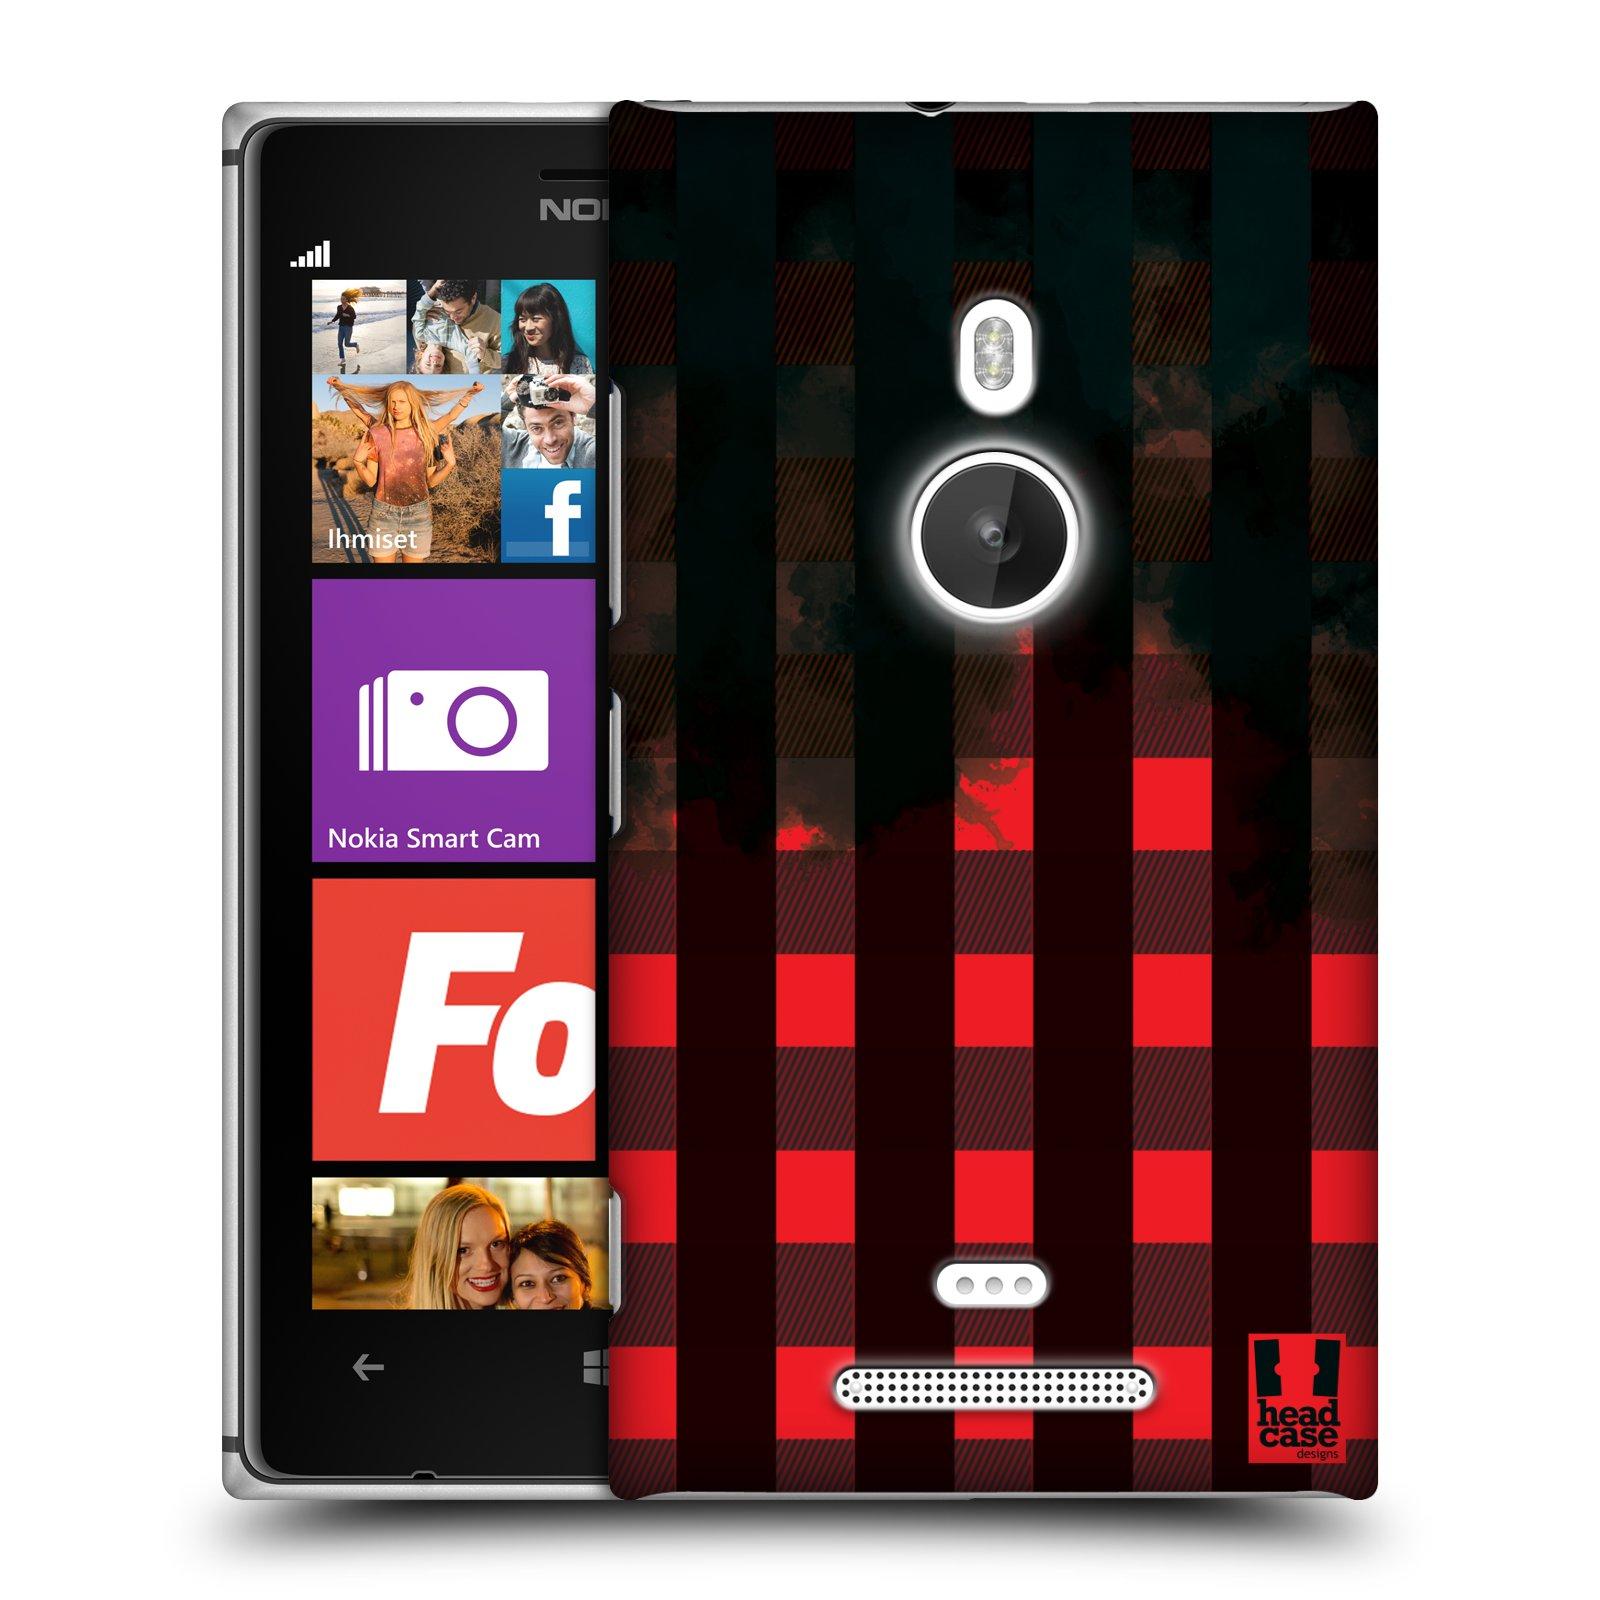 Plastové pouzdro na mobil Nokia Lumia 925 HEAD CASE FLANEL RED BLACK (Kryt či obal na mobilní telefon Nokia Lumia 925)